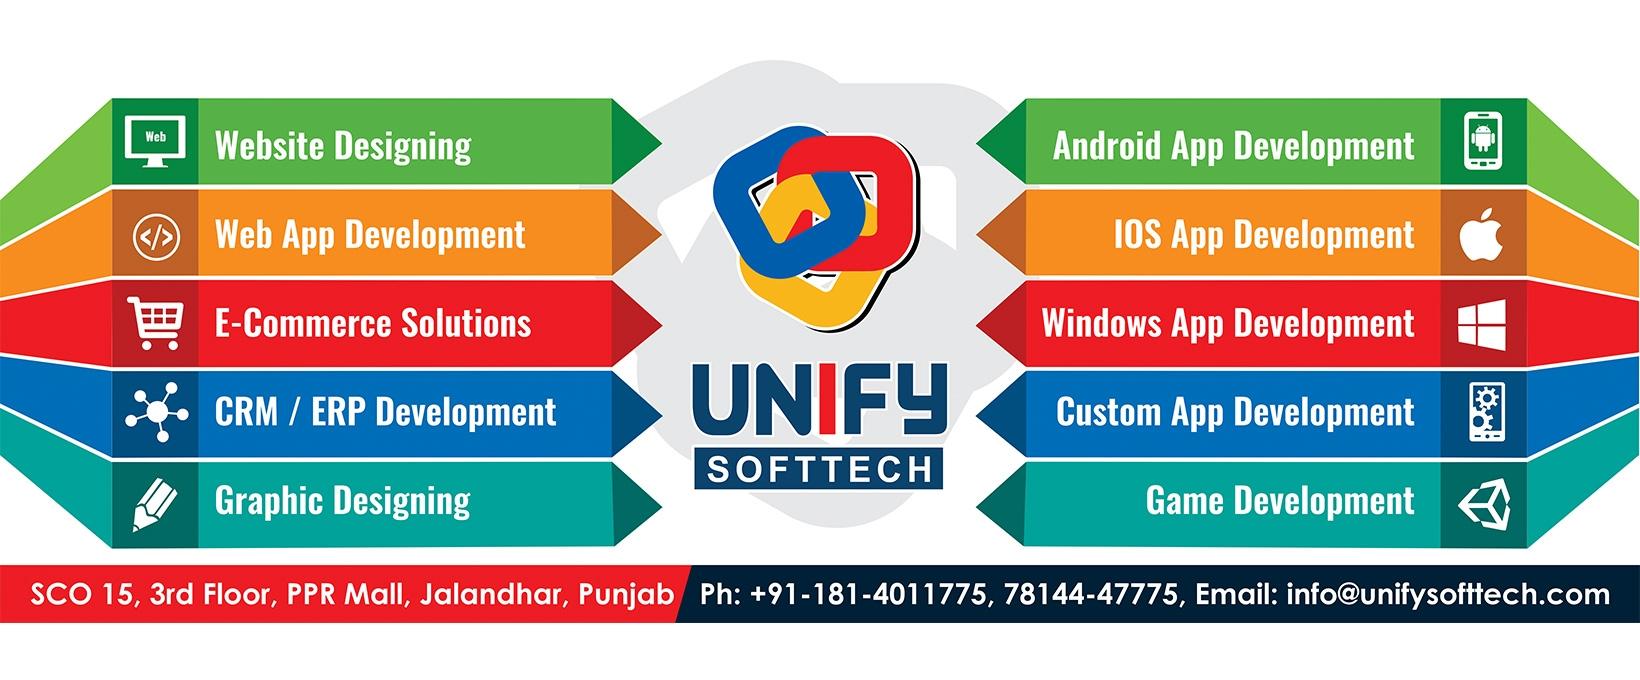 UNIFY SOFT TECH  (@unifysofttech) Cover Image